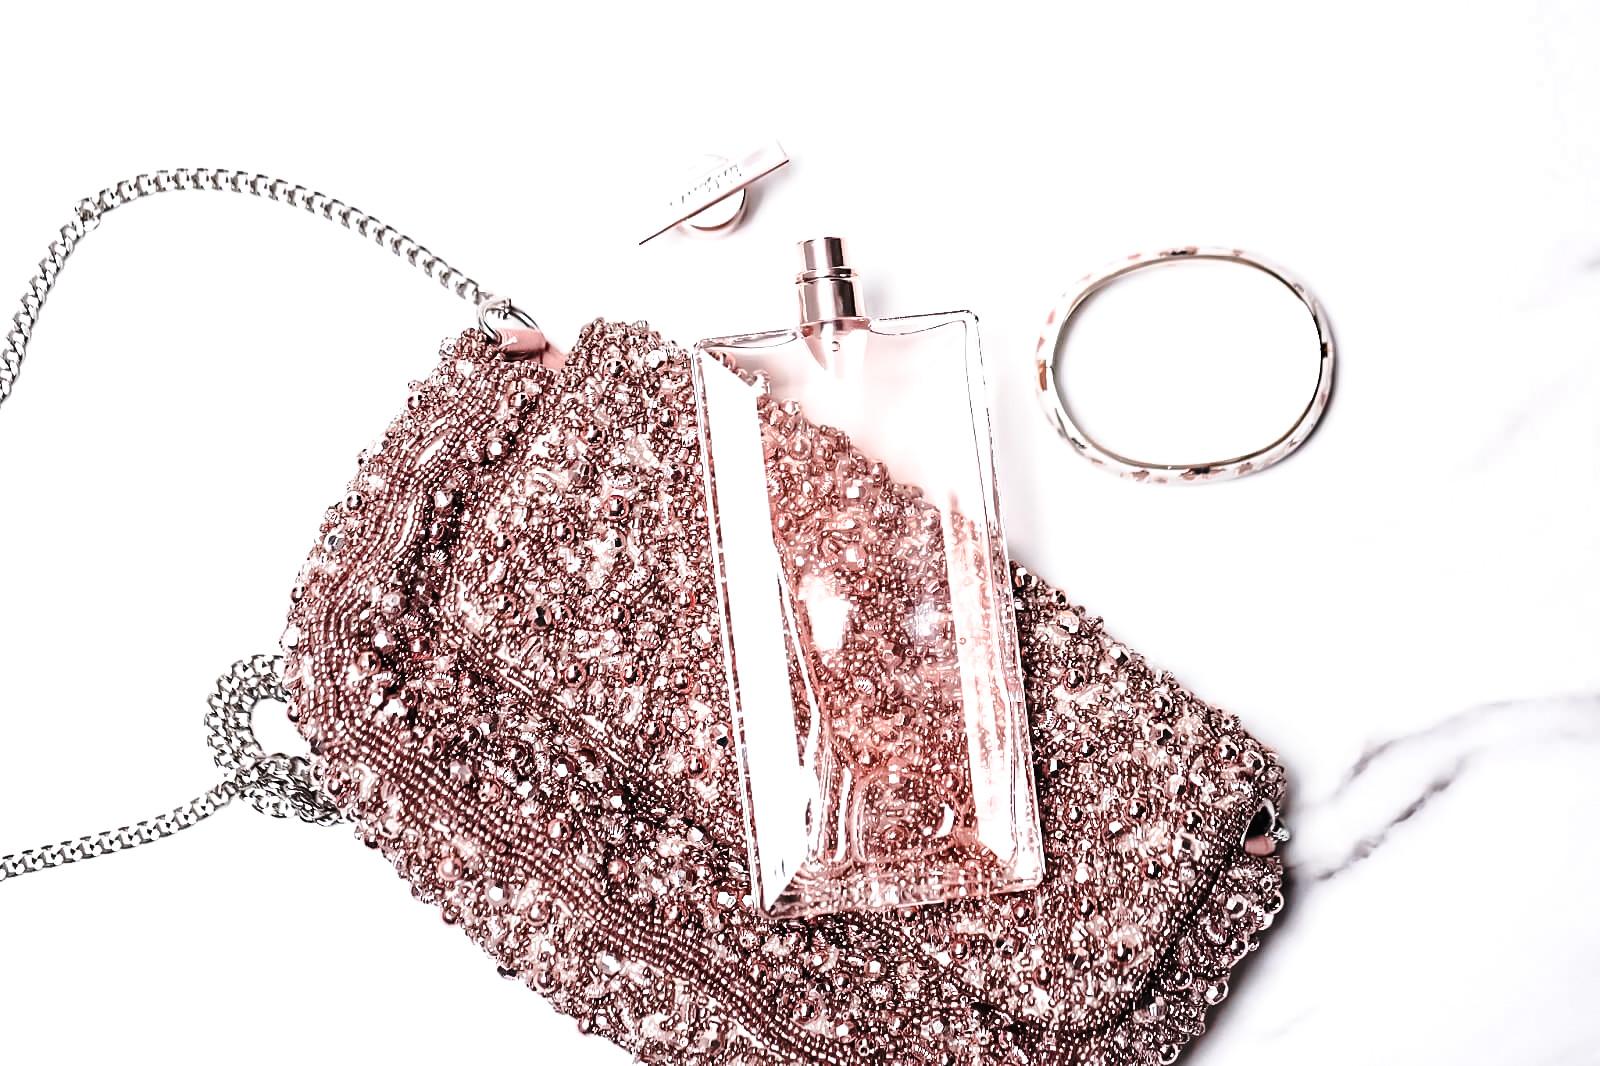 Lancôme Idôle Parfum Avis